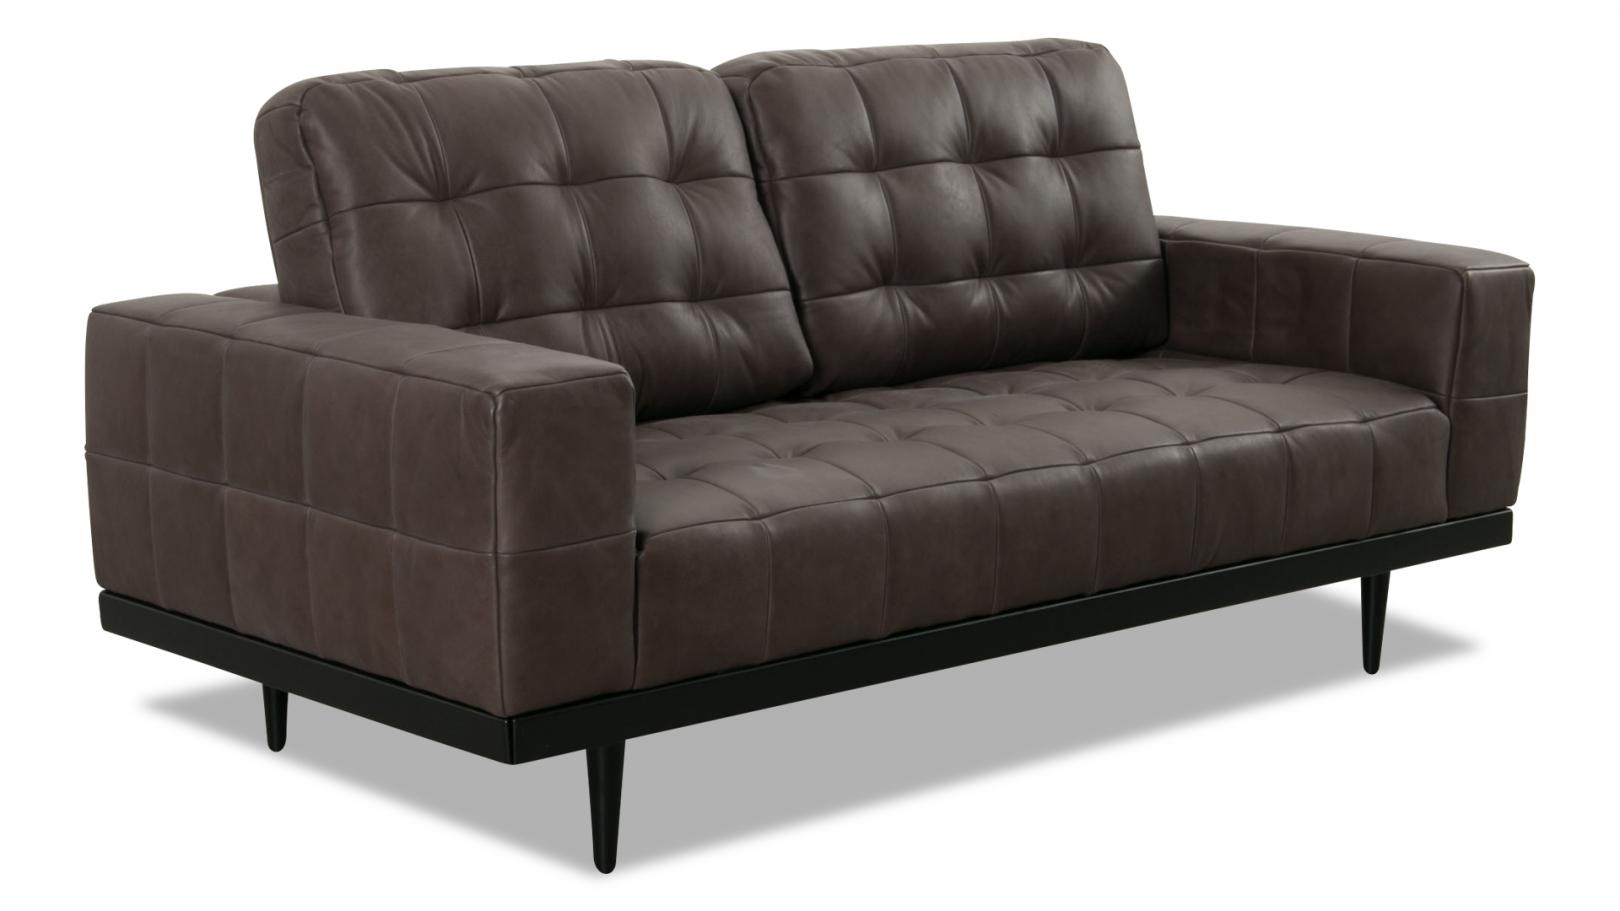 Sitzdesign Markenmobel In 2020 Ruckenkissen Sofa Outlet Sitzen